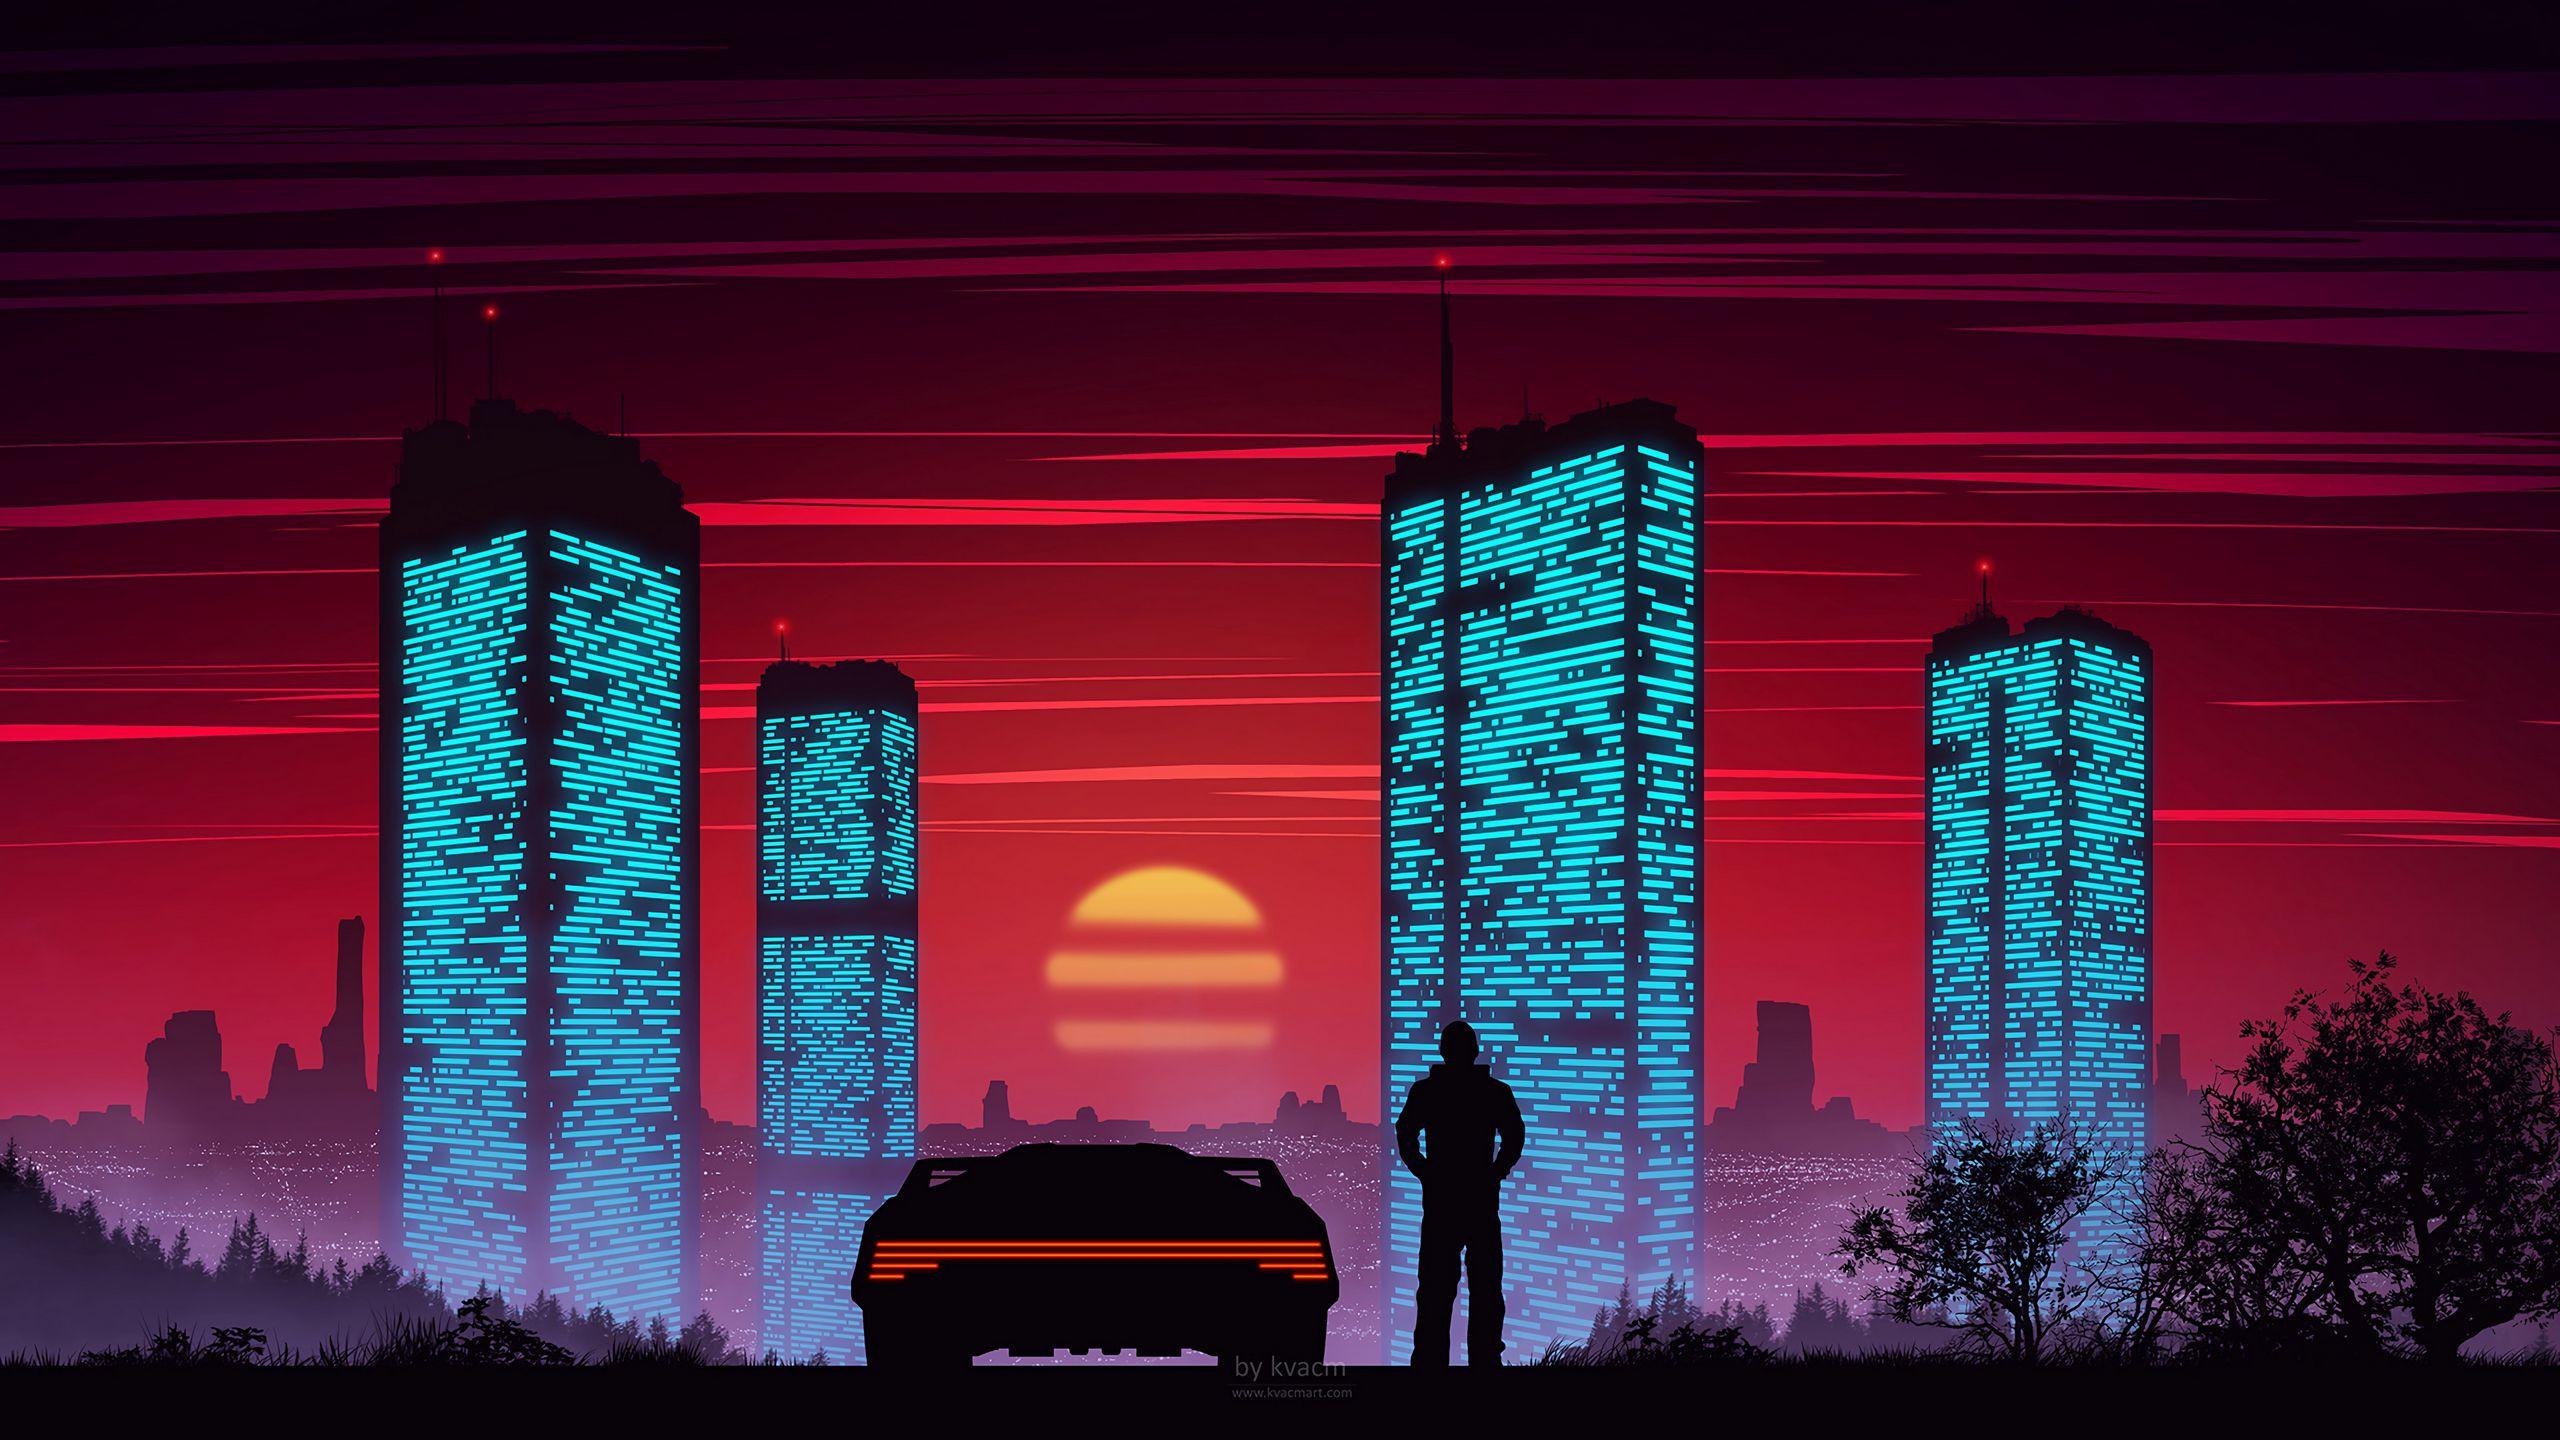 2560x1440 Wallpaper silhouette, car, city, sunset, buildings, art, vector